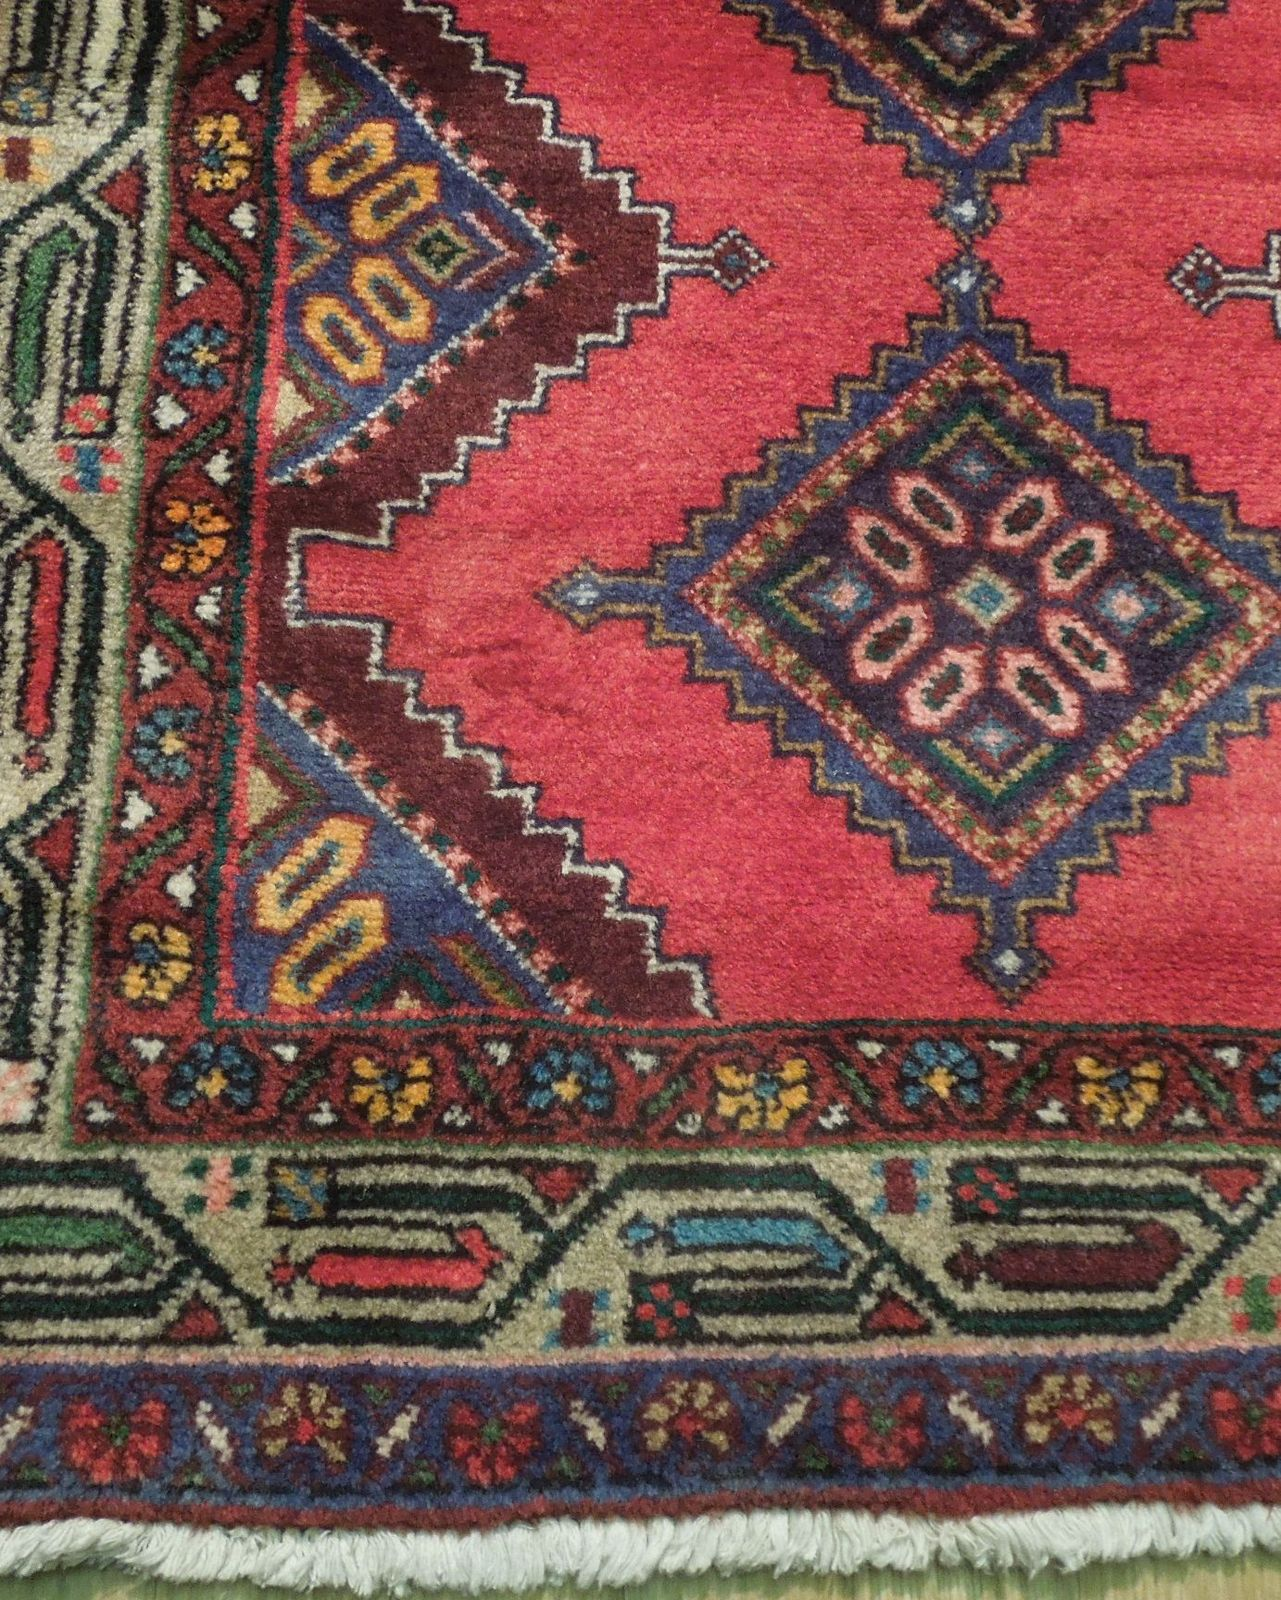 Pink Hamadan Persian Wool Handmade Rug 3x9 All-Over Geometric Rug image 3